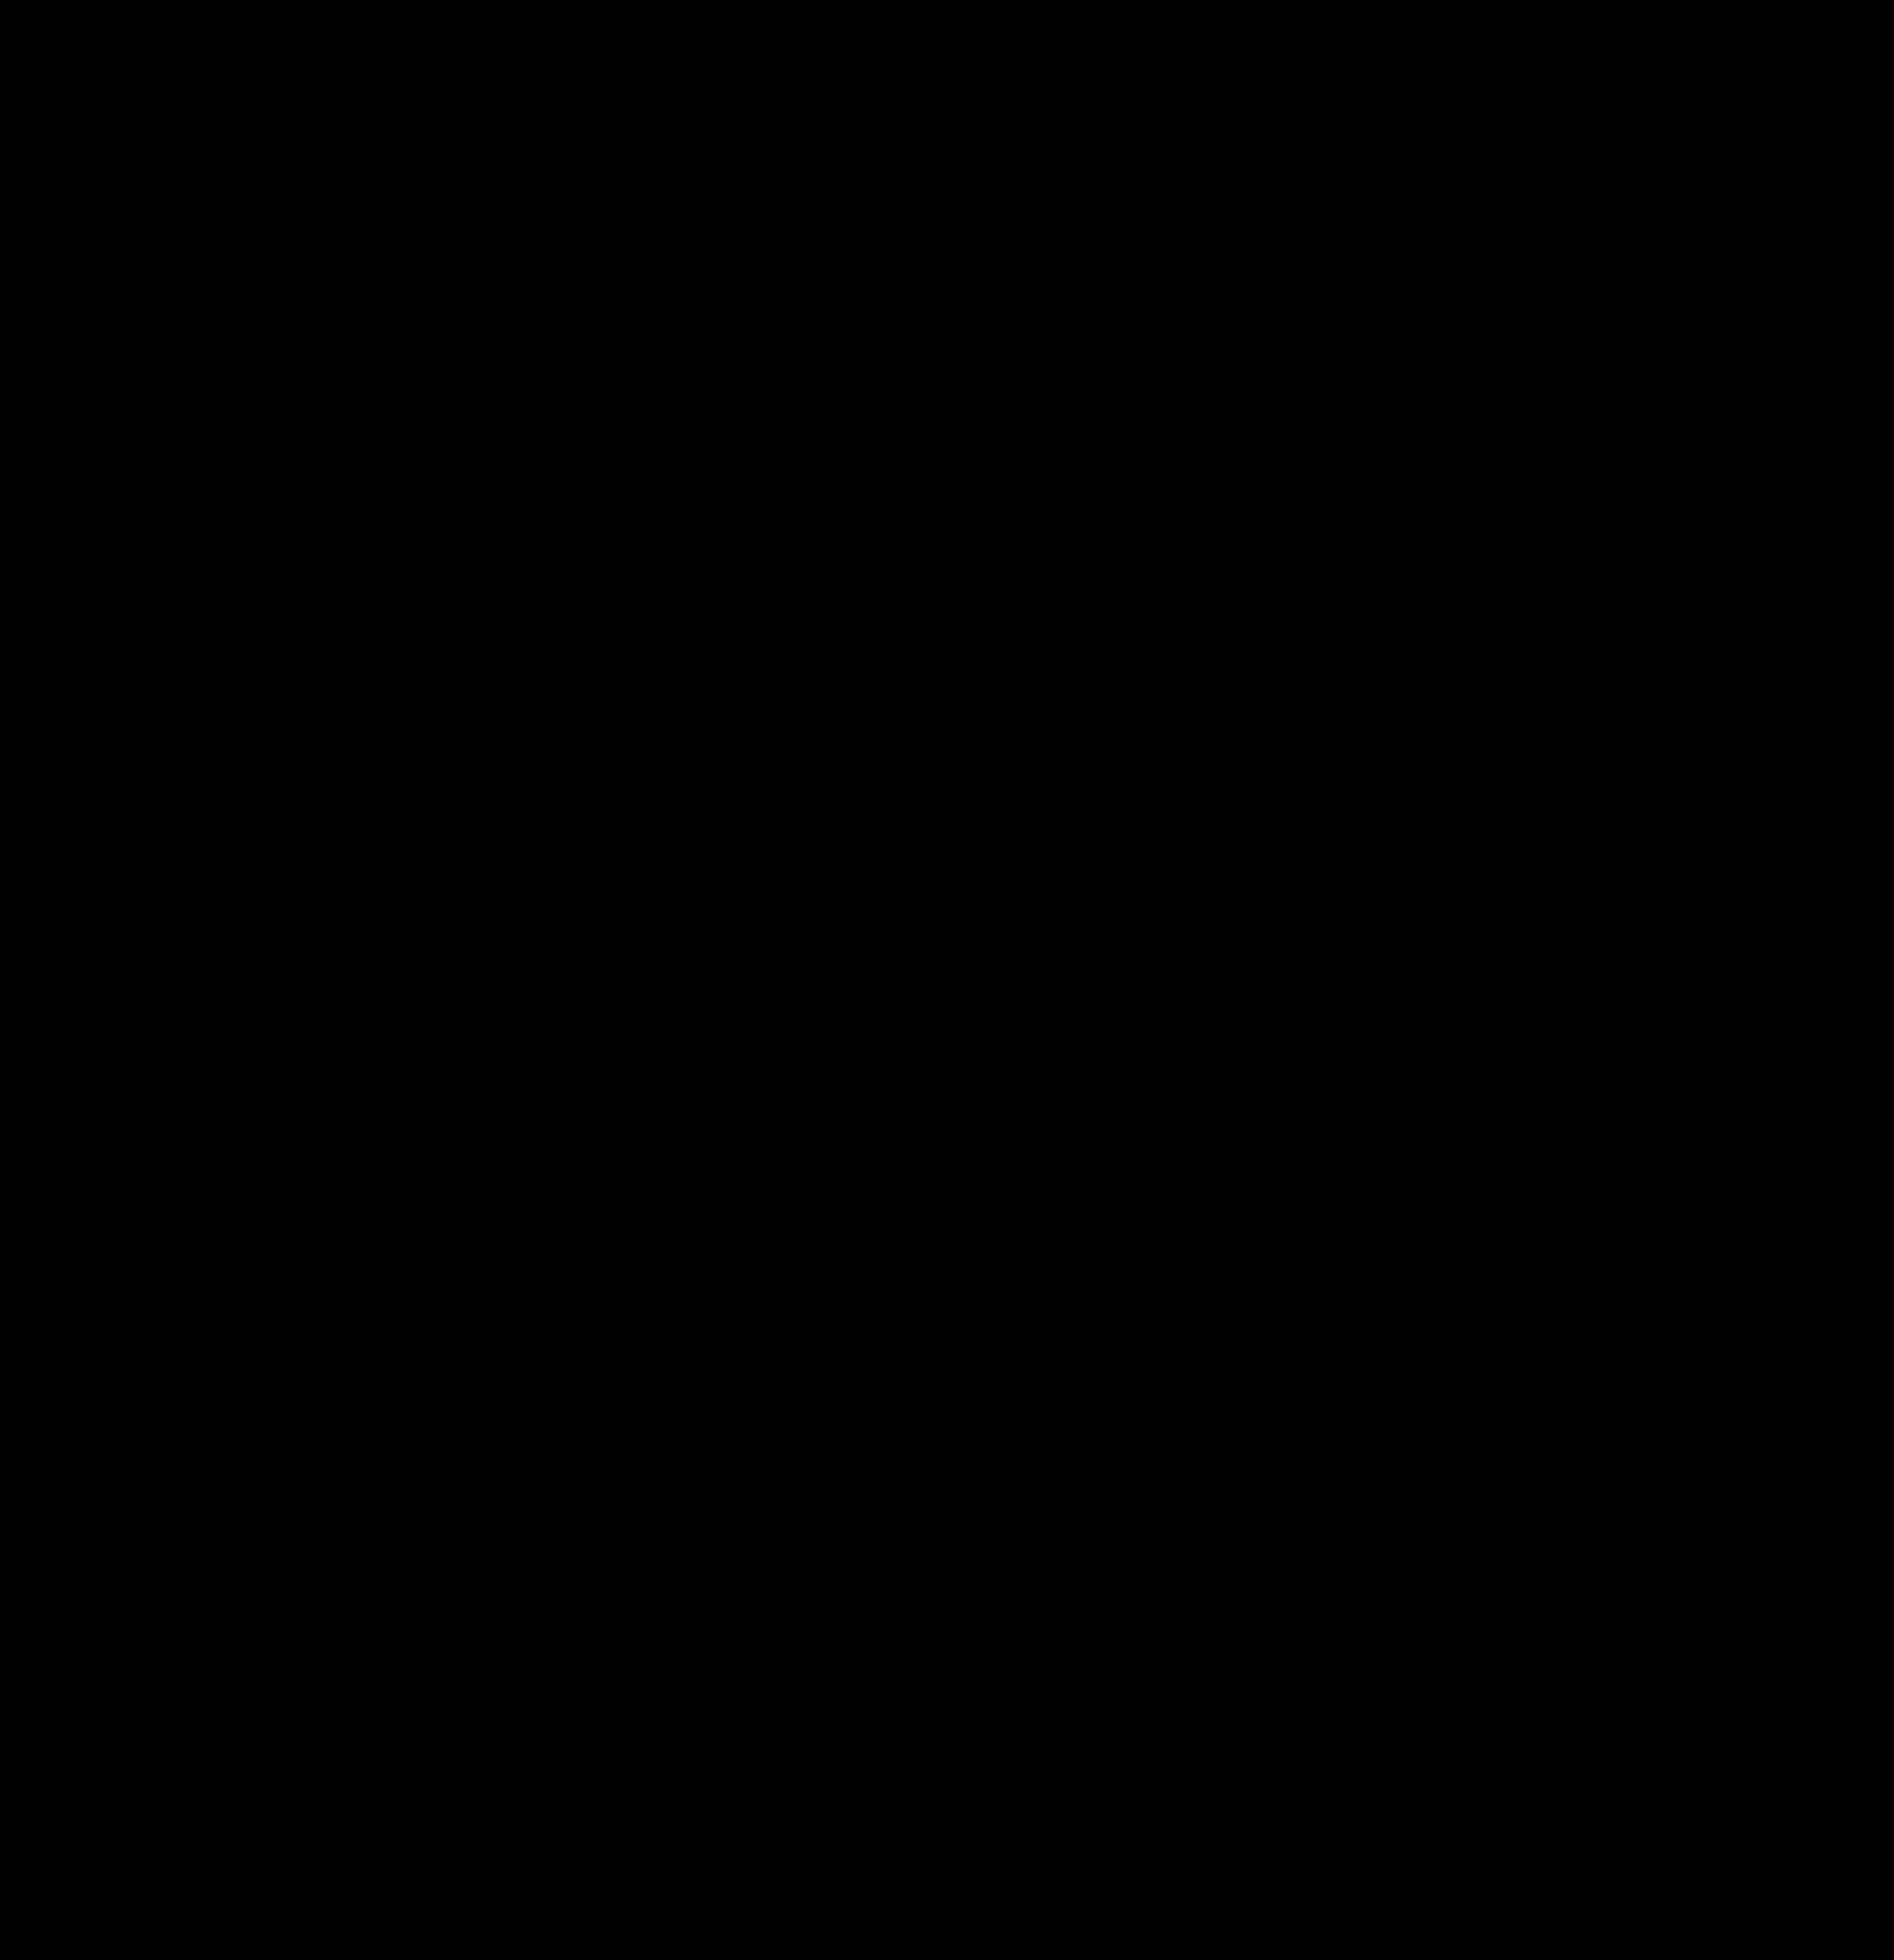 51b601bd343 GUCCI Logo PNG Transparent   SVG Vector - Freebie Supply